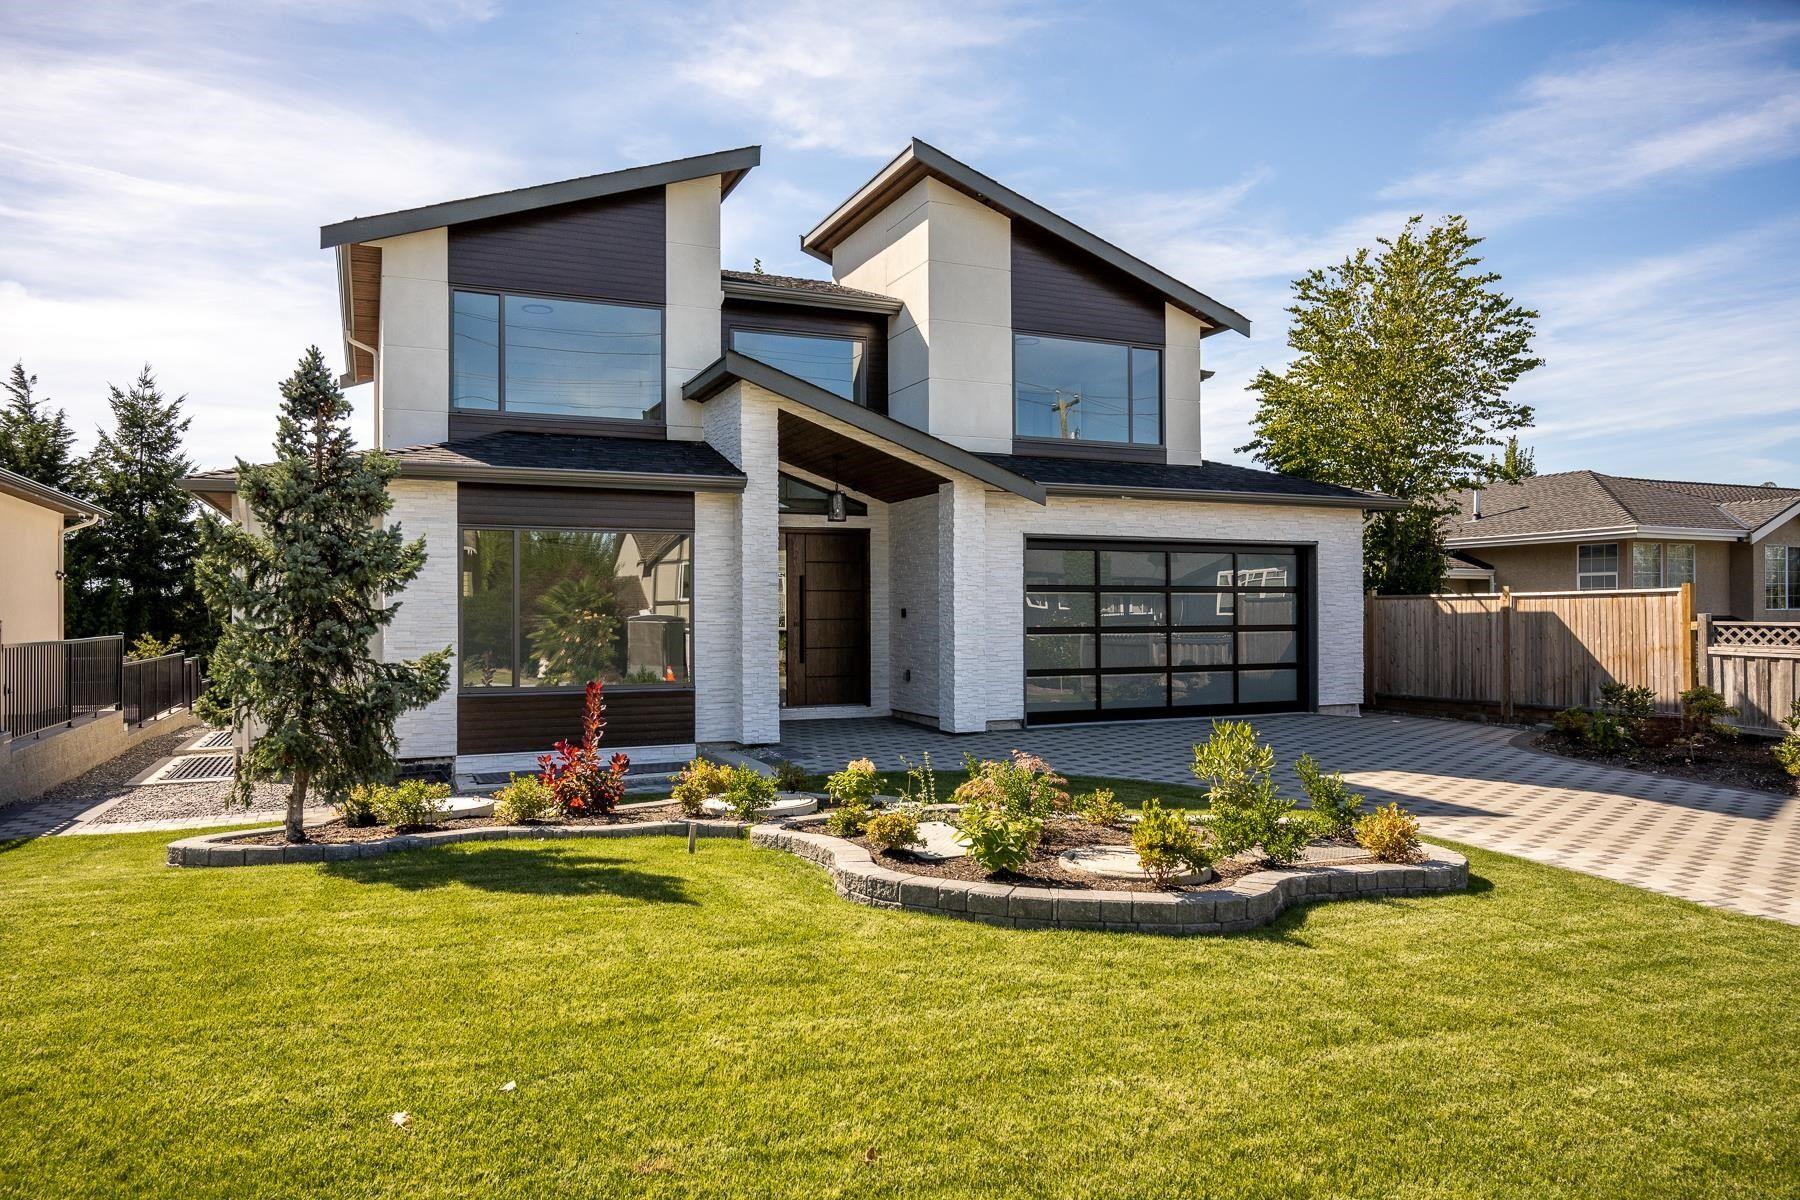 Main Photo: 1637 53A Street in Delta: Cliff Drive House for sale (Tsawwassen)  : MLS®# R2609549